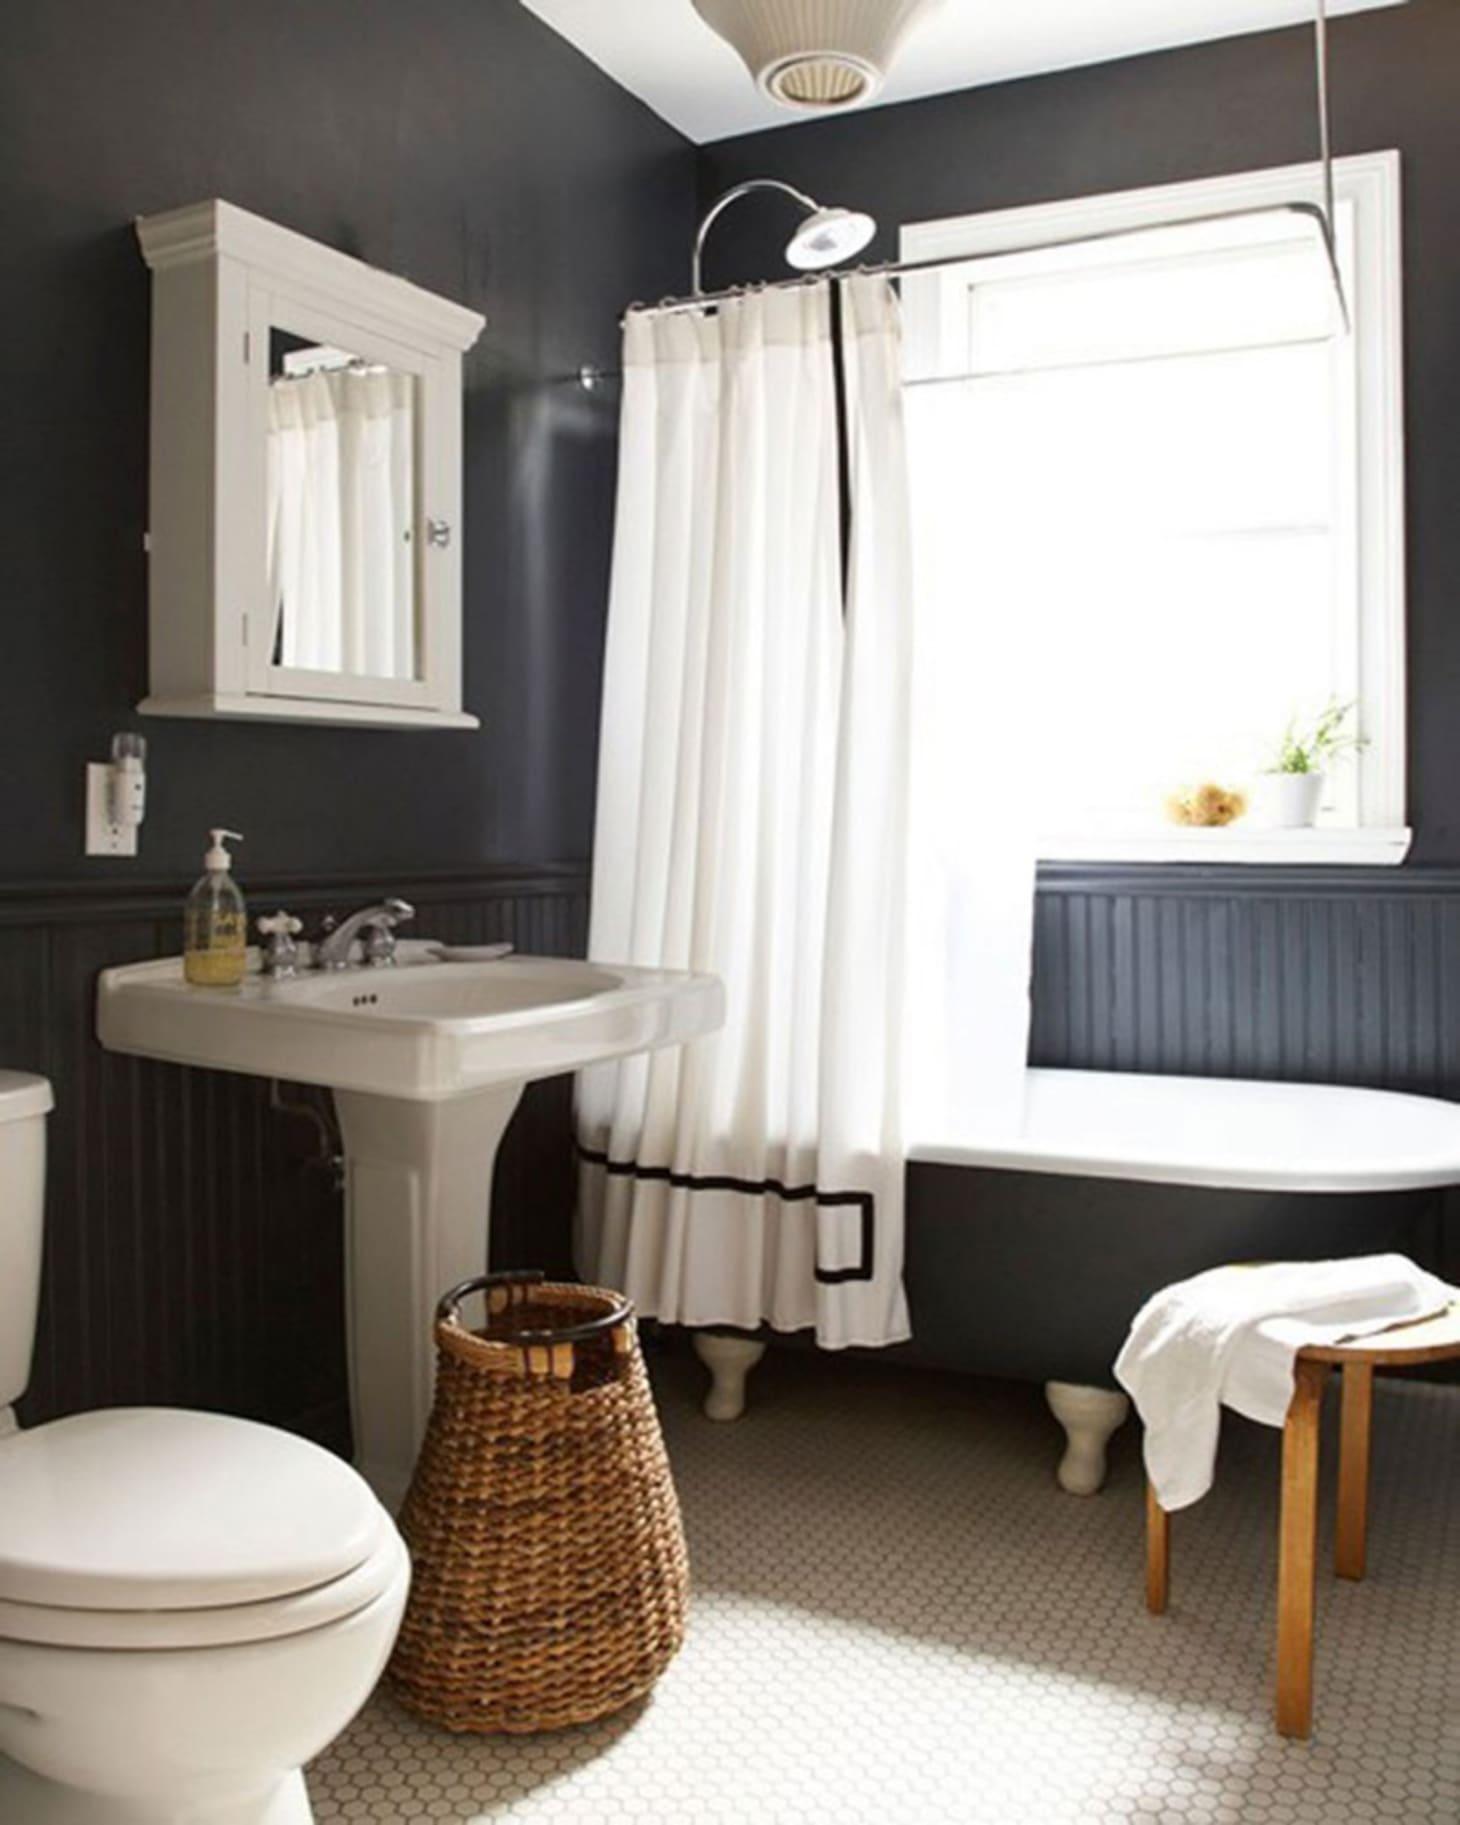 Wainscoting Bathroom: Decorating Ideas: 10 Bathrooms With Beadboard Wainscoting